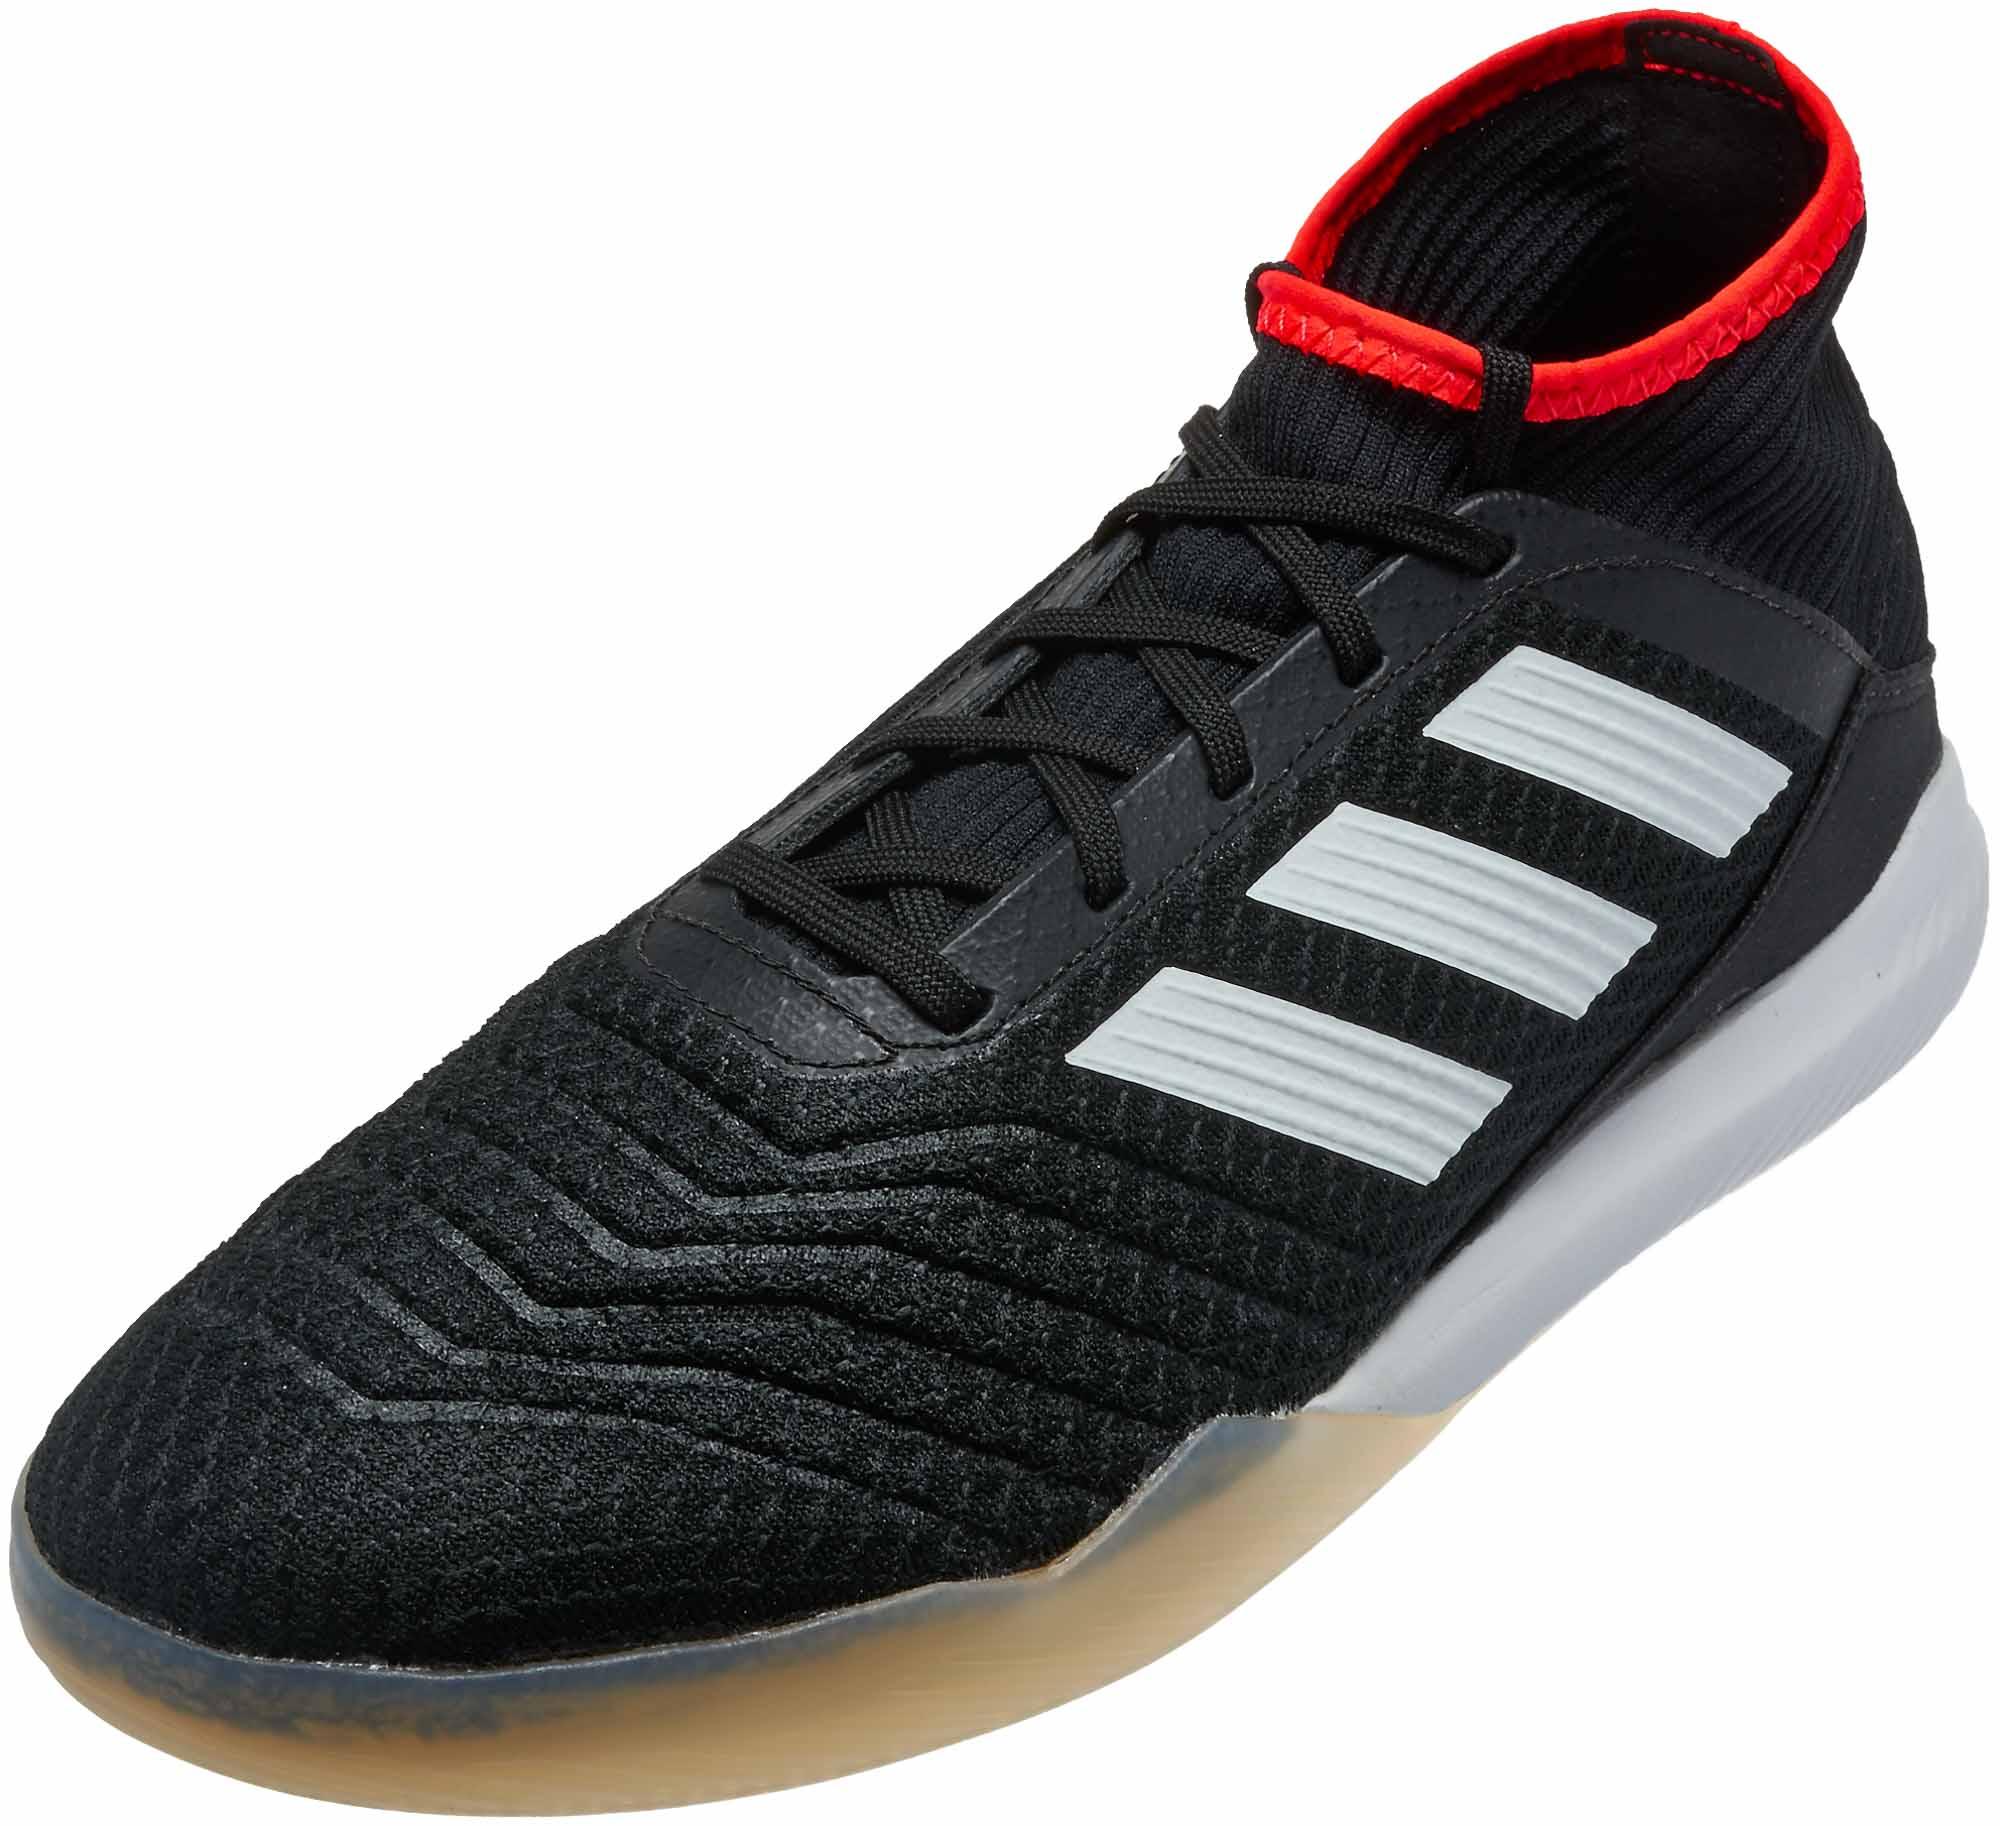 newest 24671 8ce28 adidas Predator Tango 18.3 TR – Black/Solar Red